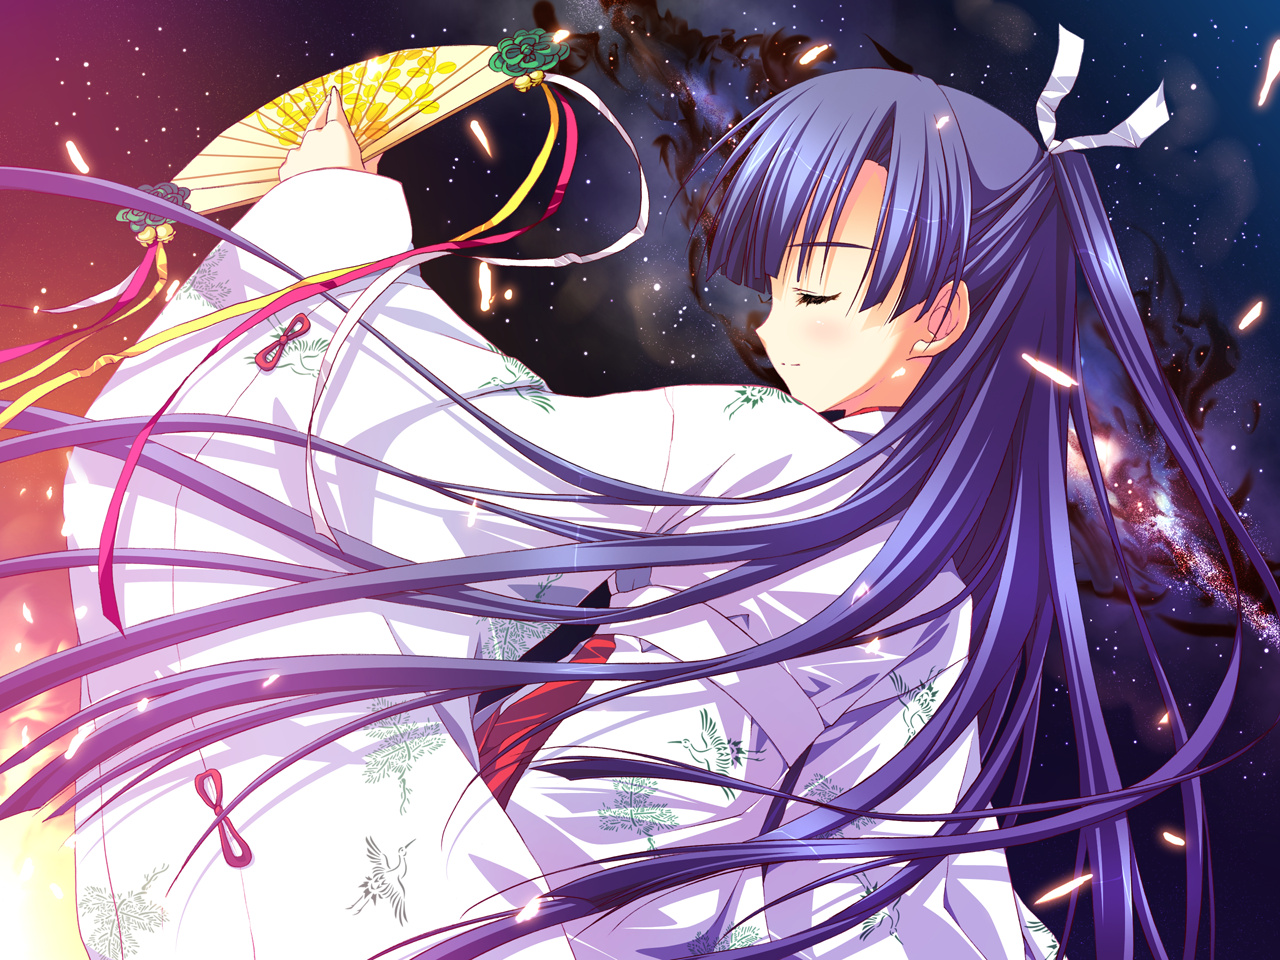 fan feng game_cg hoshizora_e_kakaru_hashi japanese_clothes koumoto_madoka long_hair night purple_hair ryohka yukata